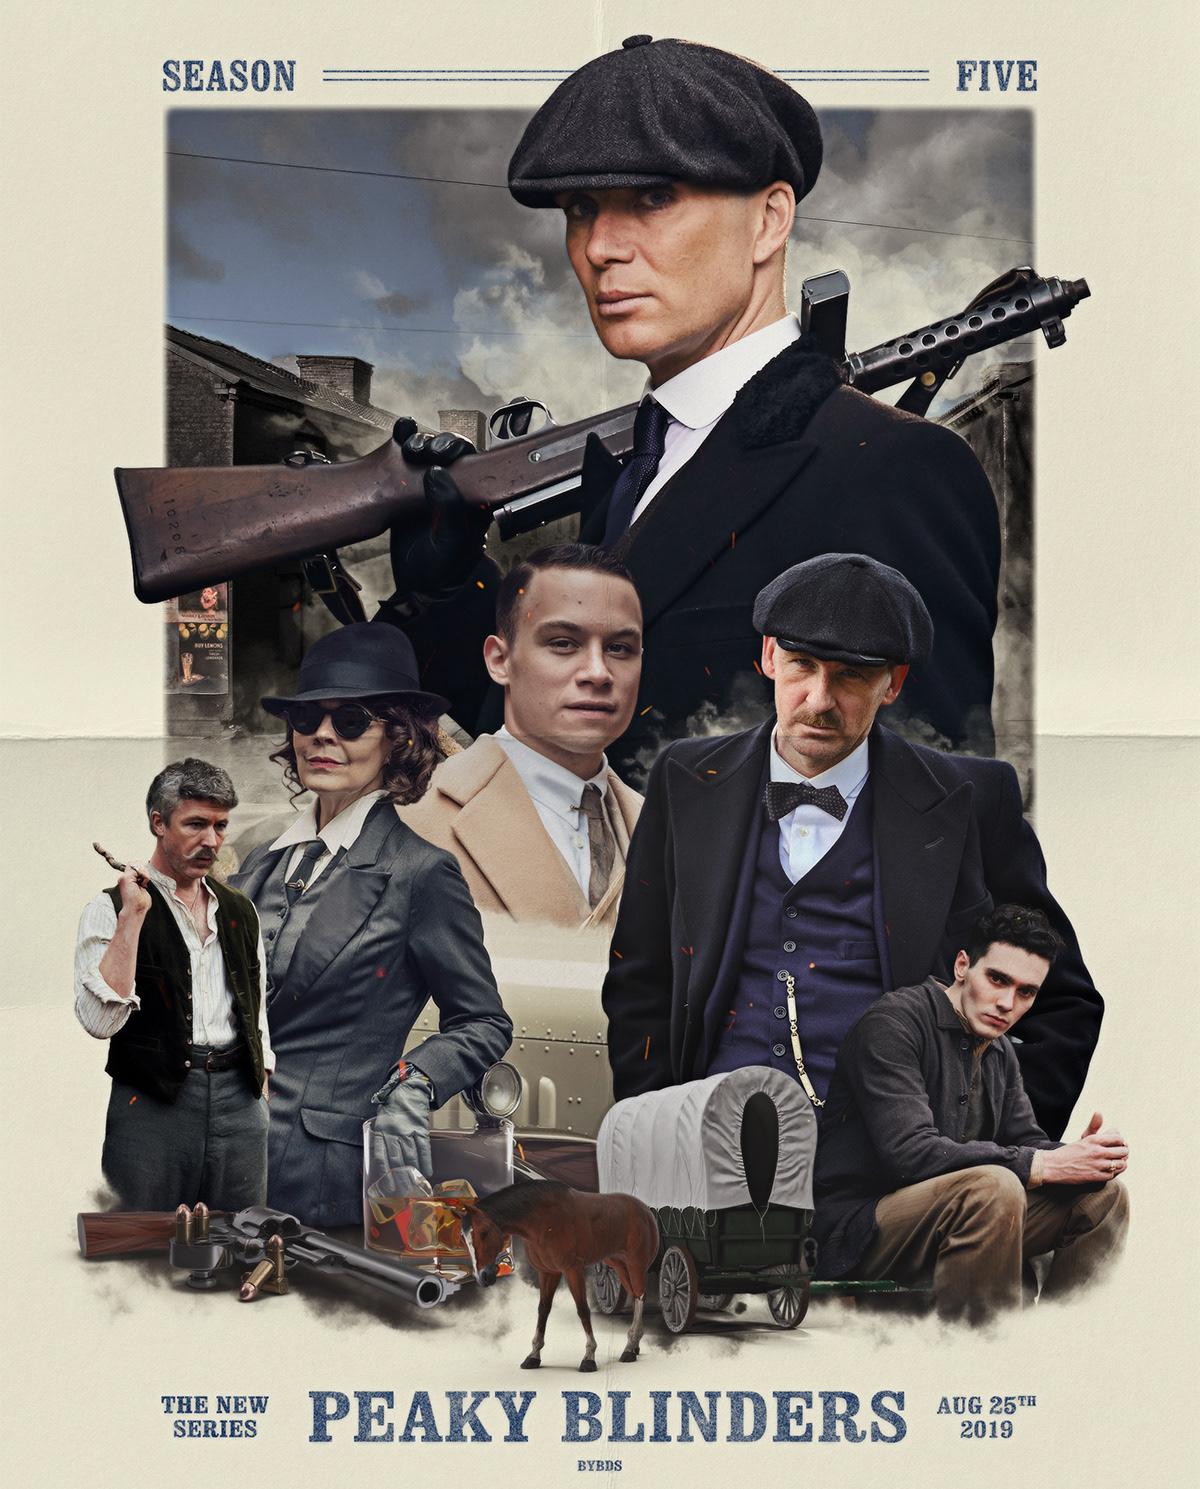 Peaky Blinders — Season 5 Poster Concept — byDBDS® on Behance